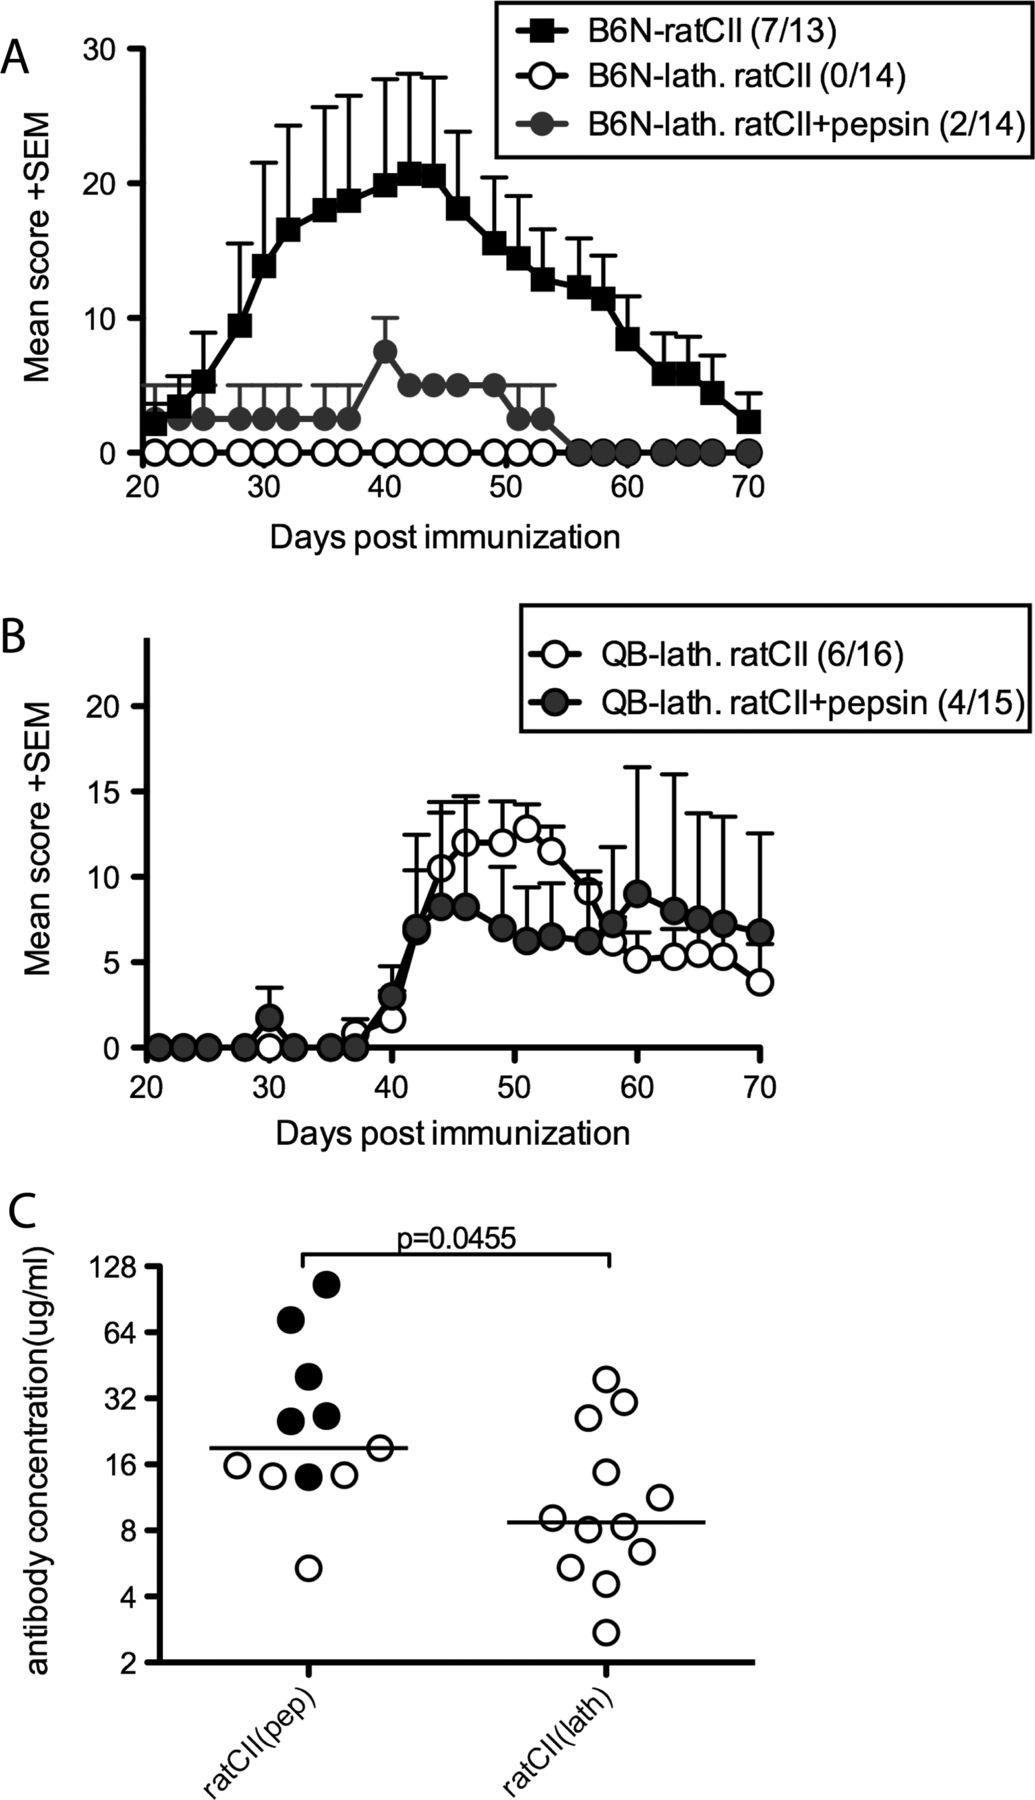 C57BL/6 mice need MHC class II Aq to develop collagen